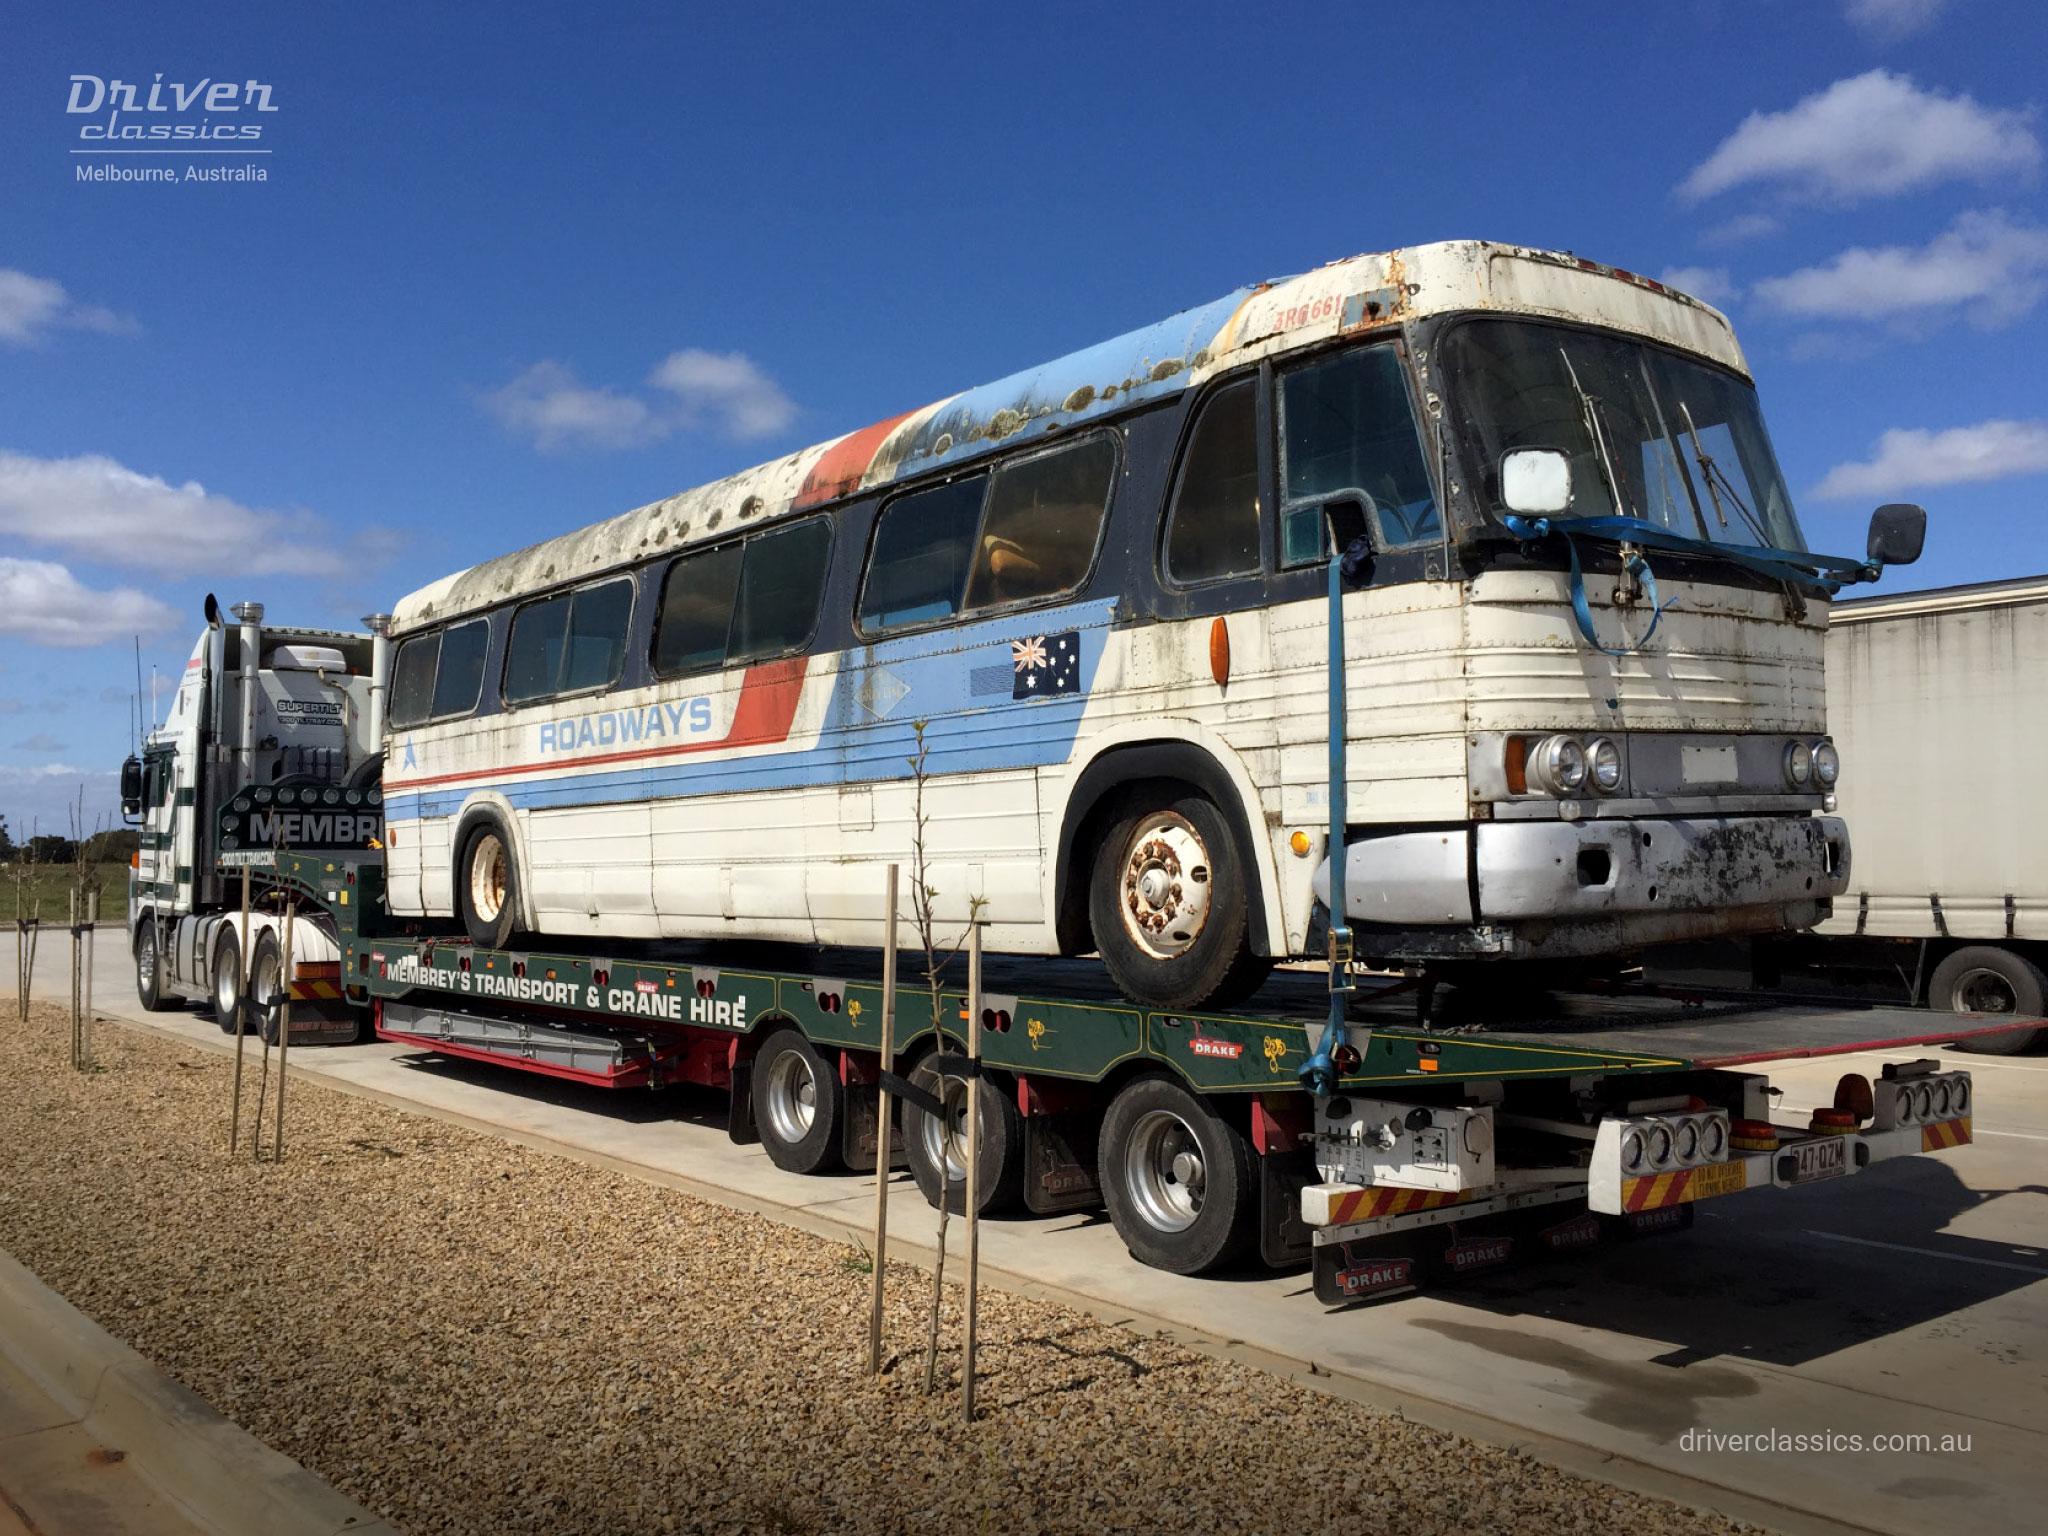 GM PD-4106 bus (1965 model), parts bus on back of truck, Photo taken September 2015